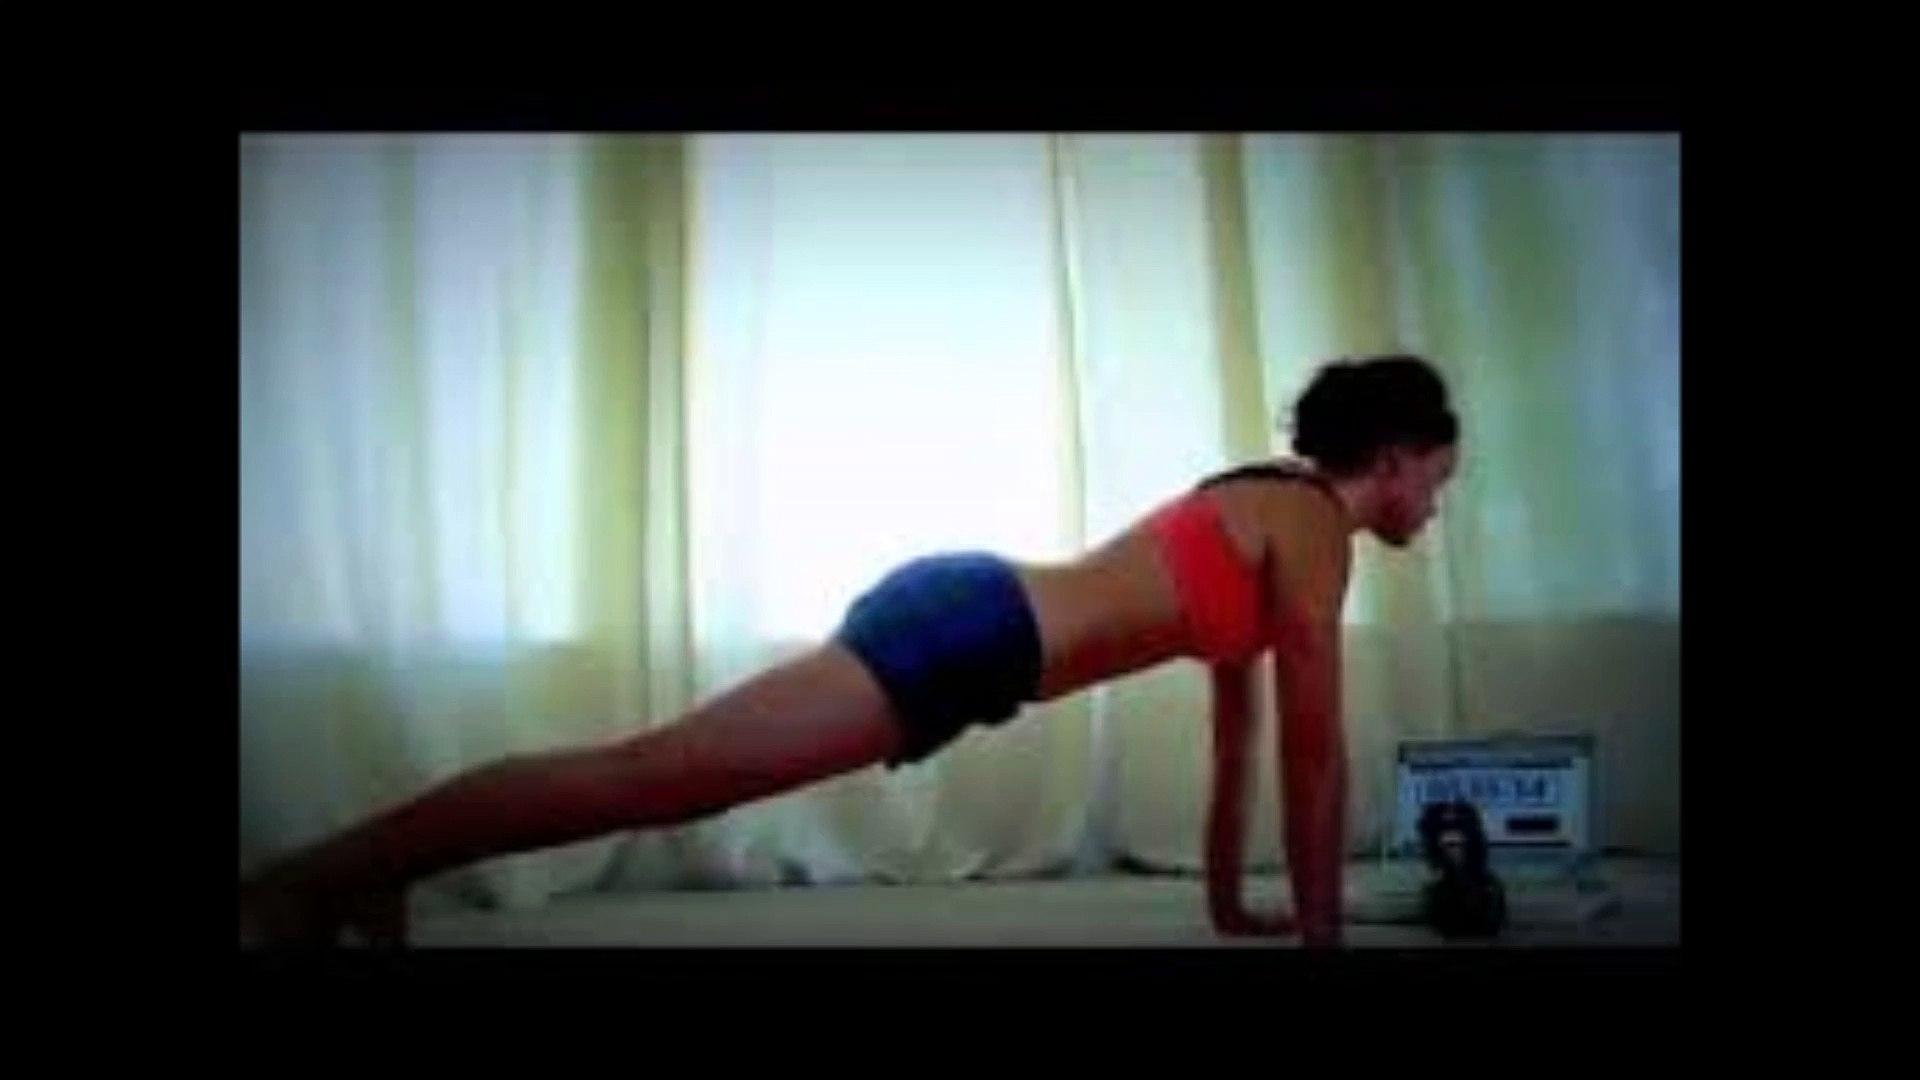 Teenage Girl Breaks The World Record For Longest Plank